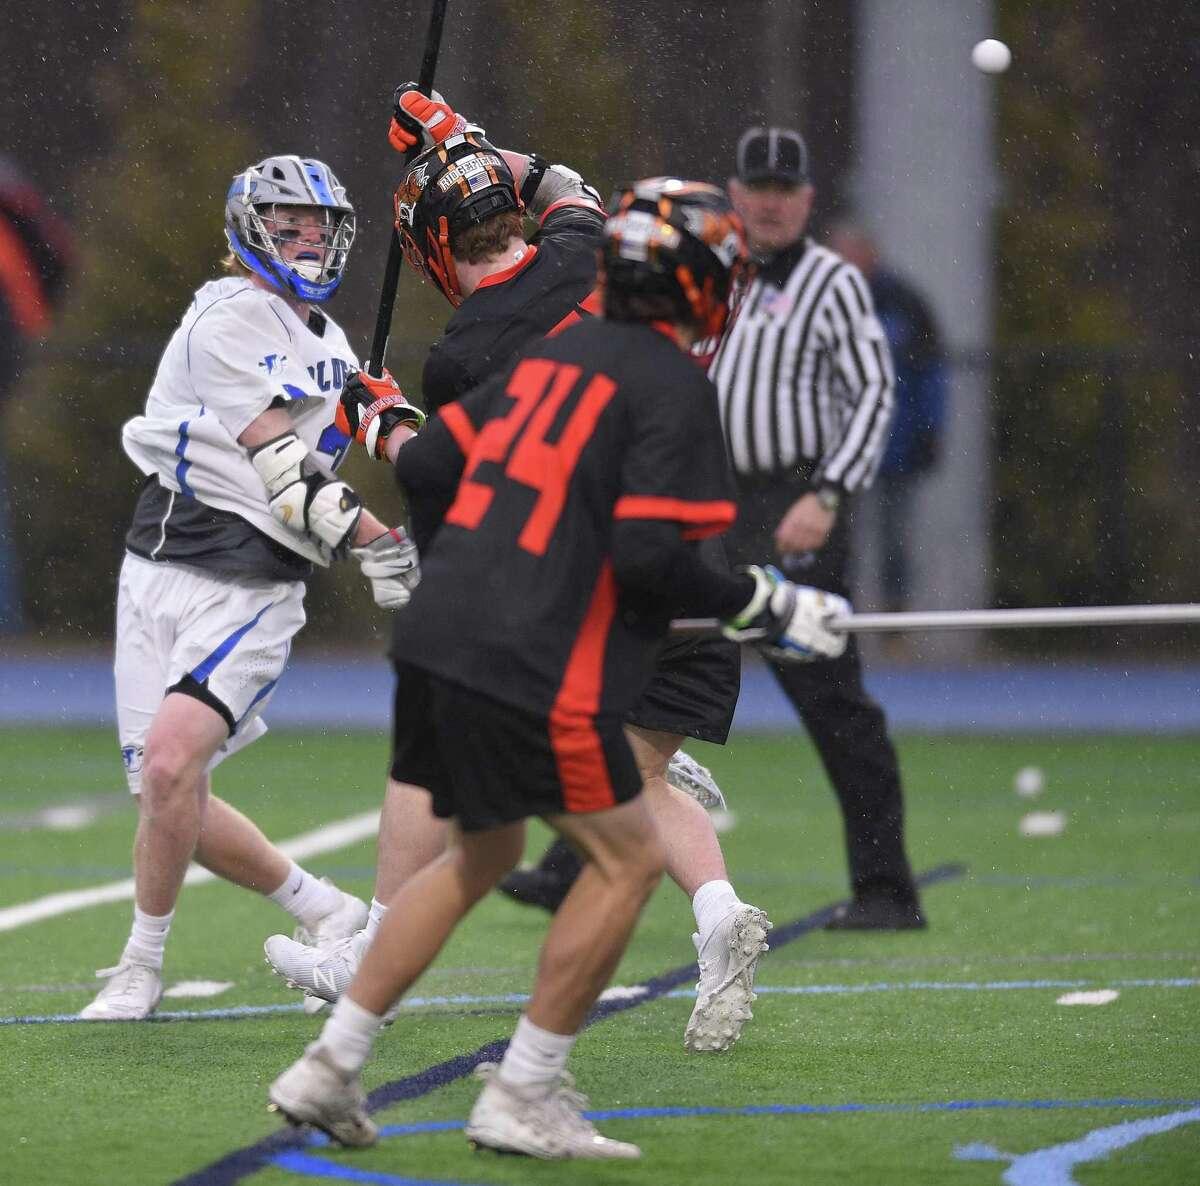 Darien defeated Ridgefield 14-6 in a boys lacrosse match at Darien High School Friday, April 5 ,2019 in Darien, Connecticut.